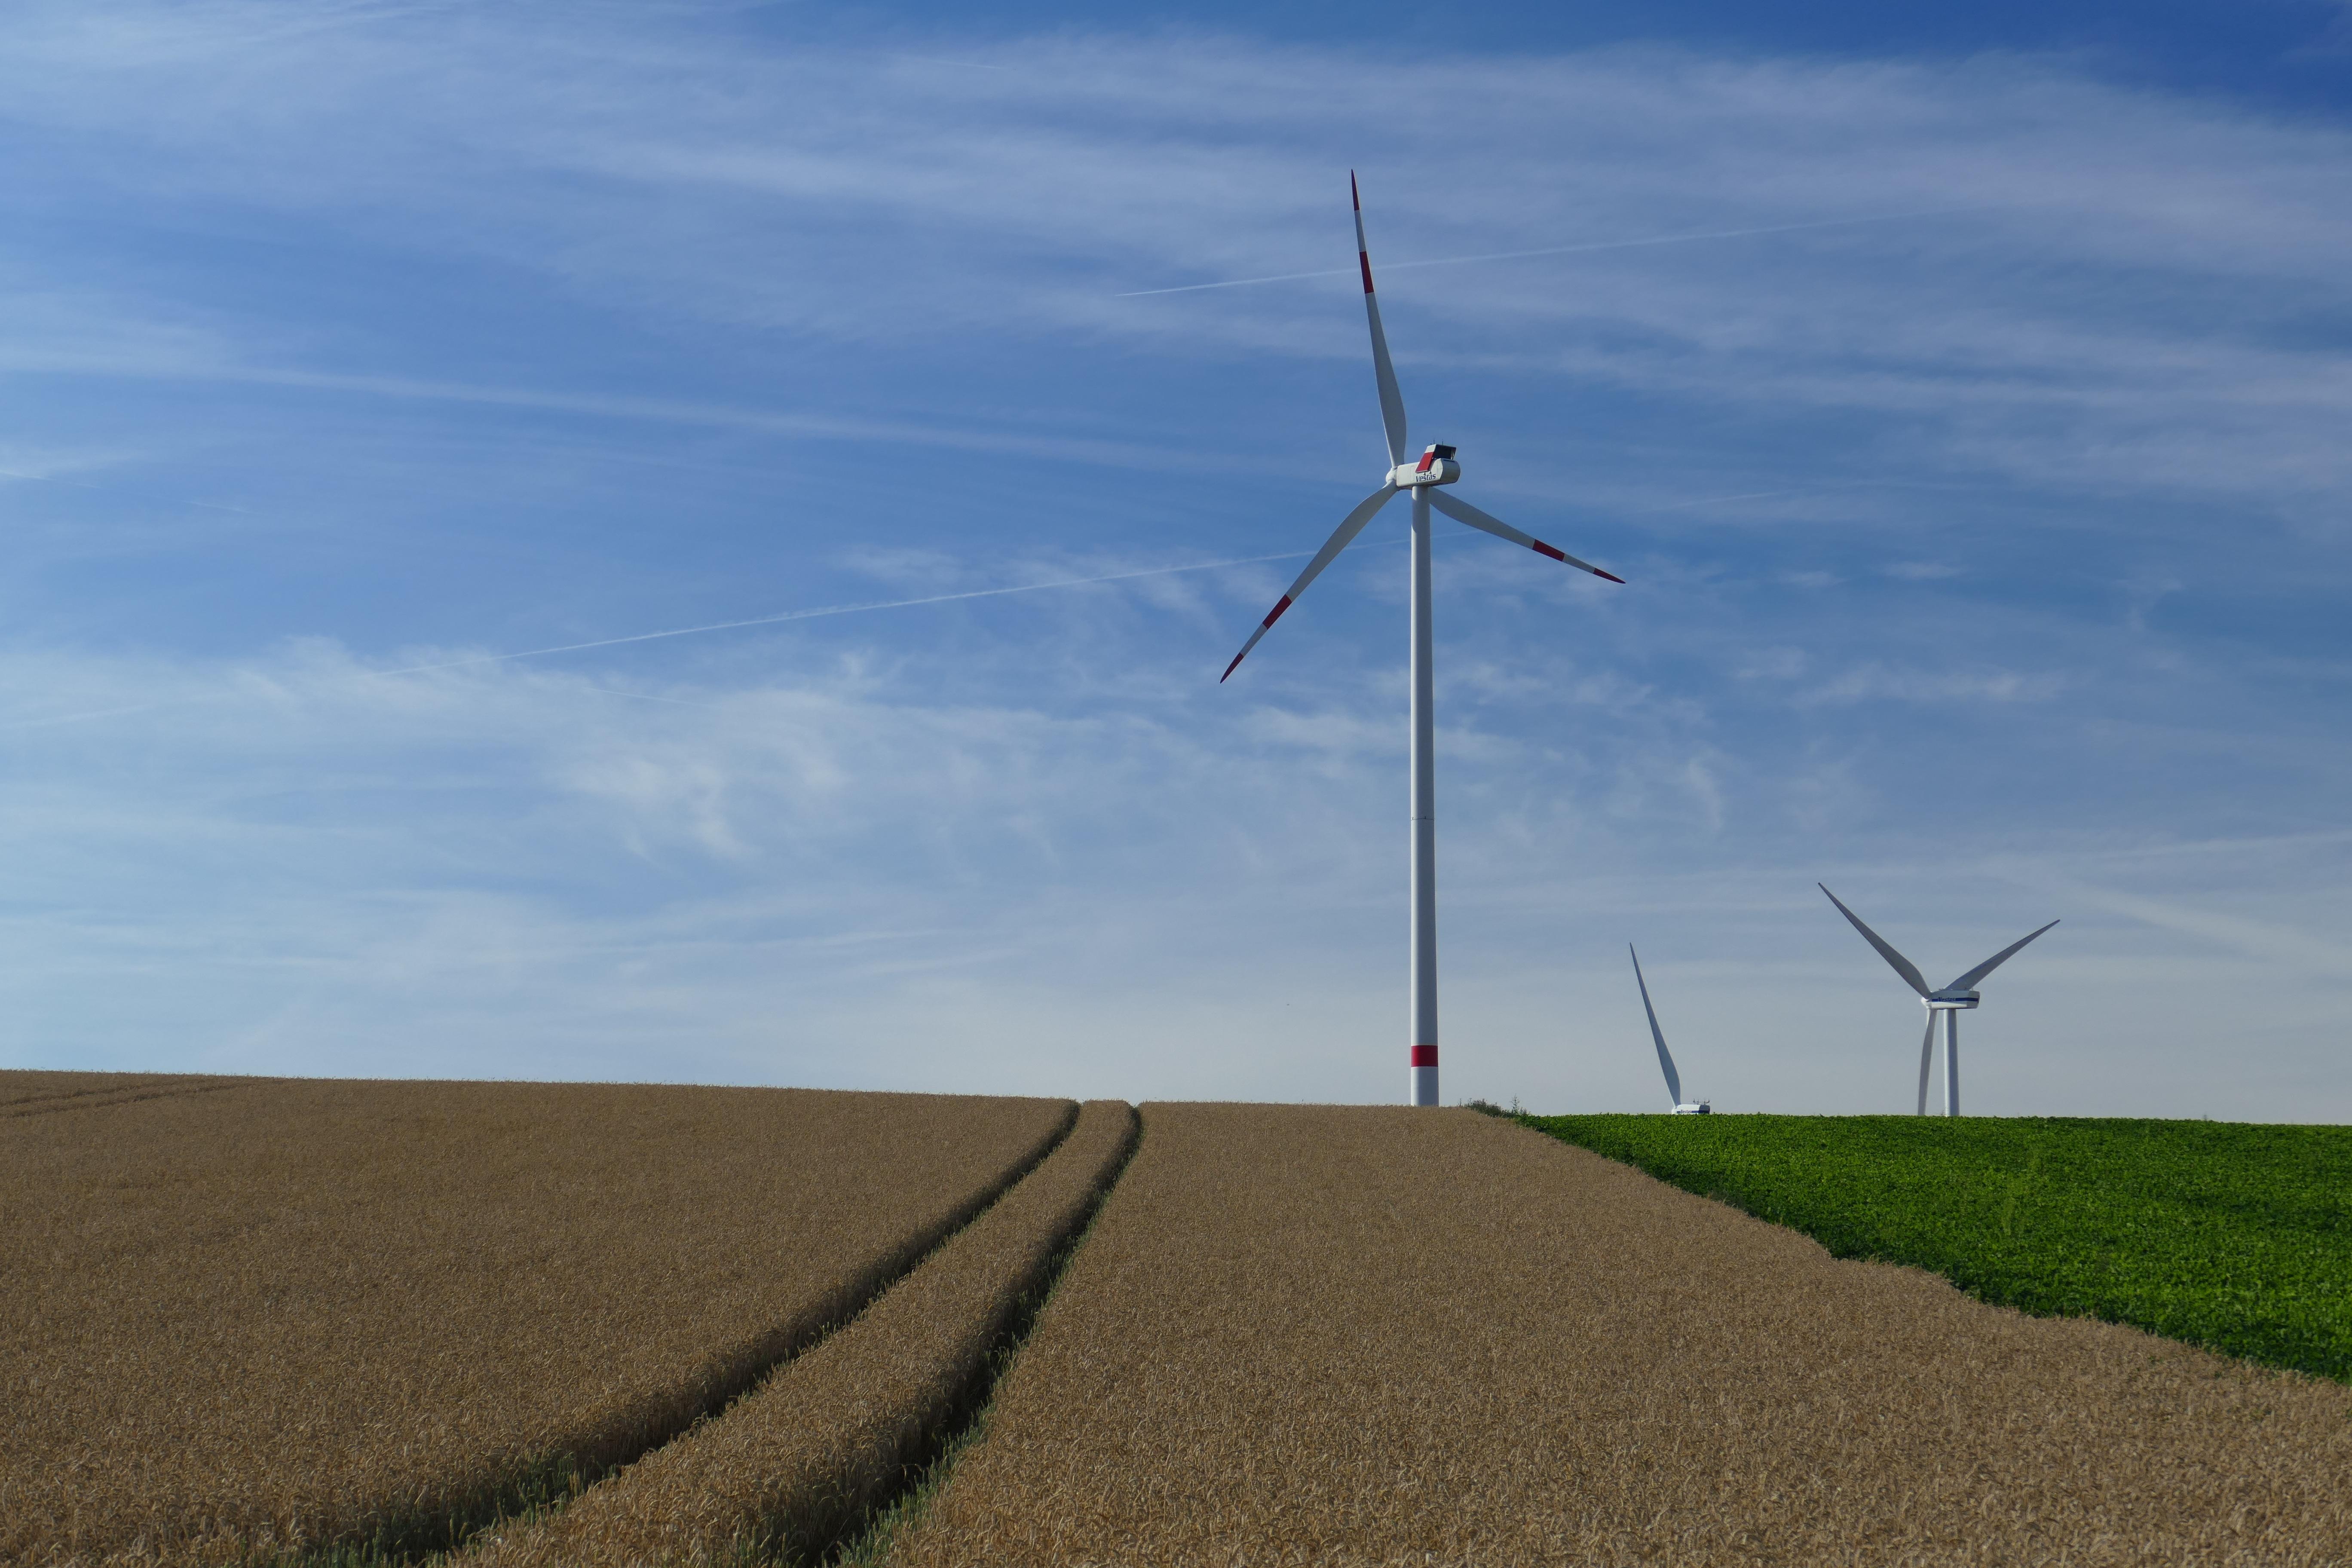 https://static.pexels.com/photos/158142/nature-vision-wind-turbines-rotors-158142.jpeg